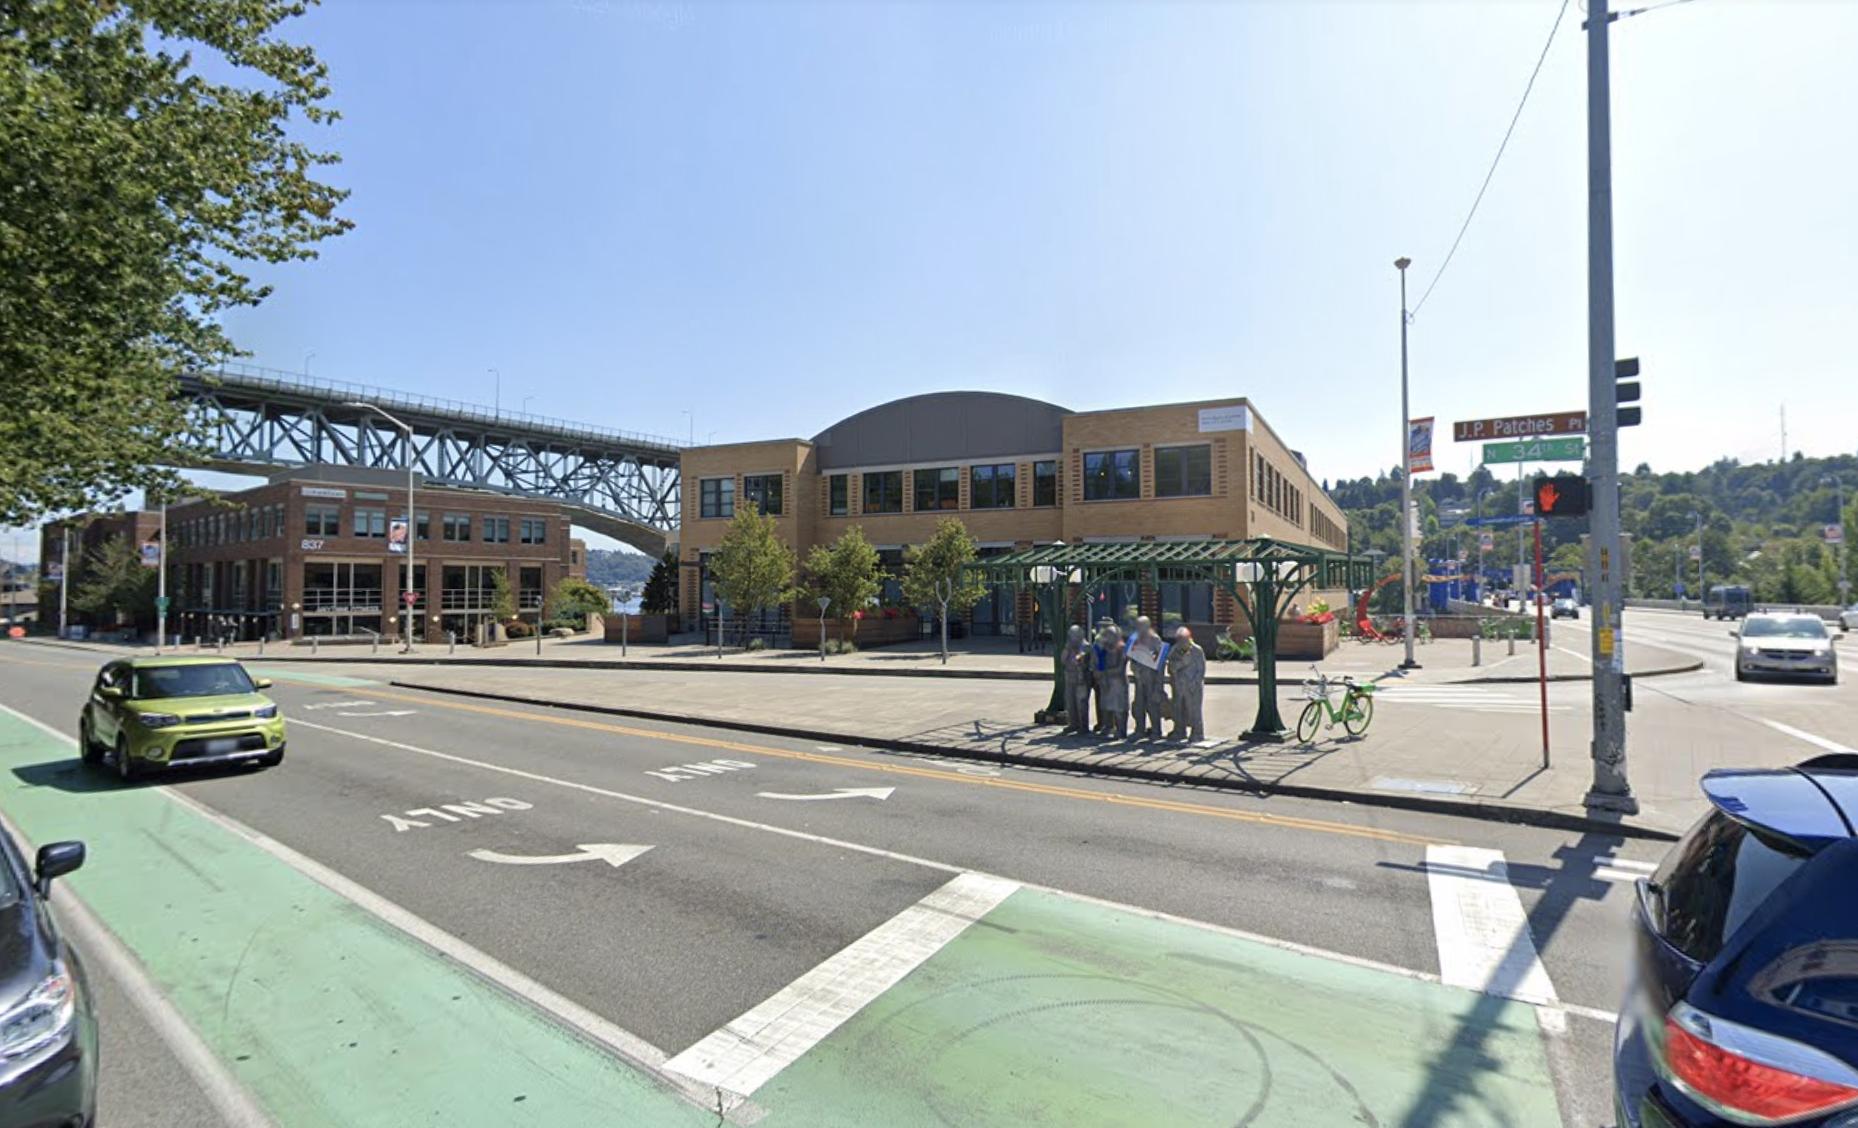 Detours coming to Fremont as bike lane enhancements start on N 34th St this week